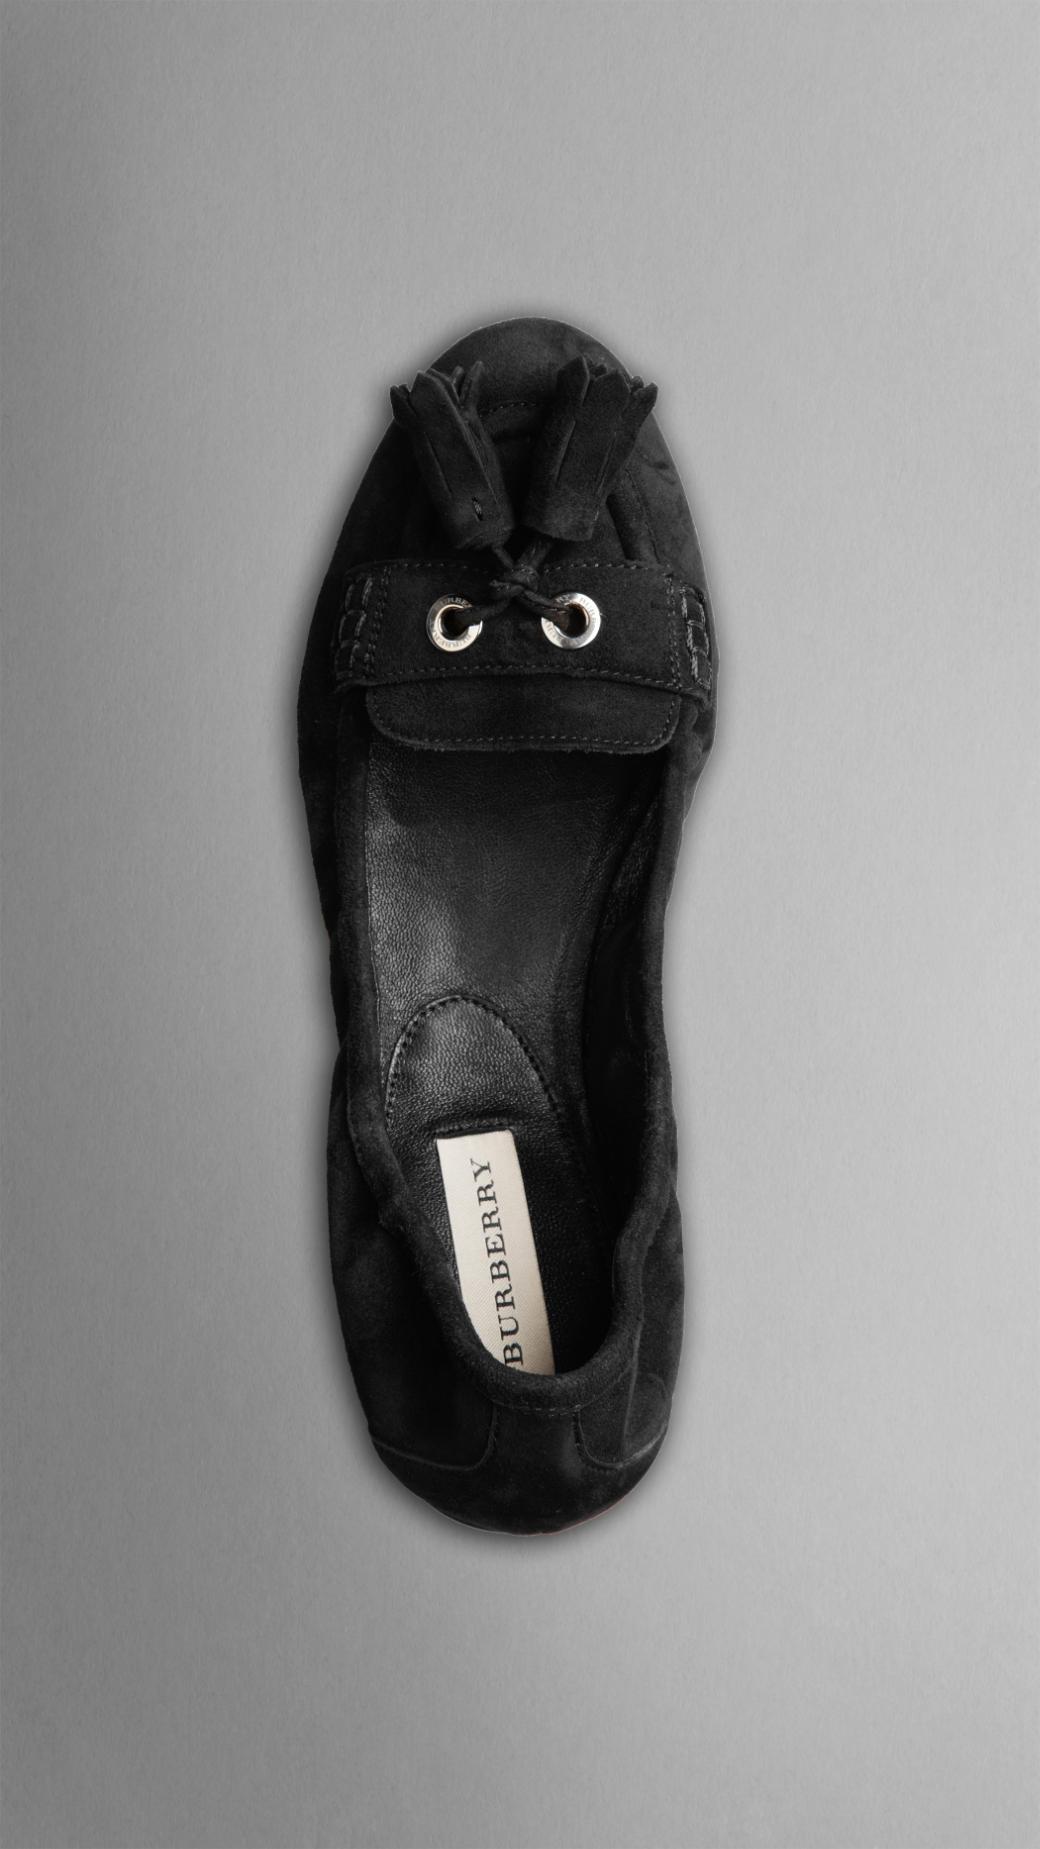 Lyst Burberry Suede Tassel Ballerinas In Black